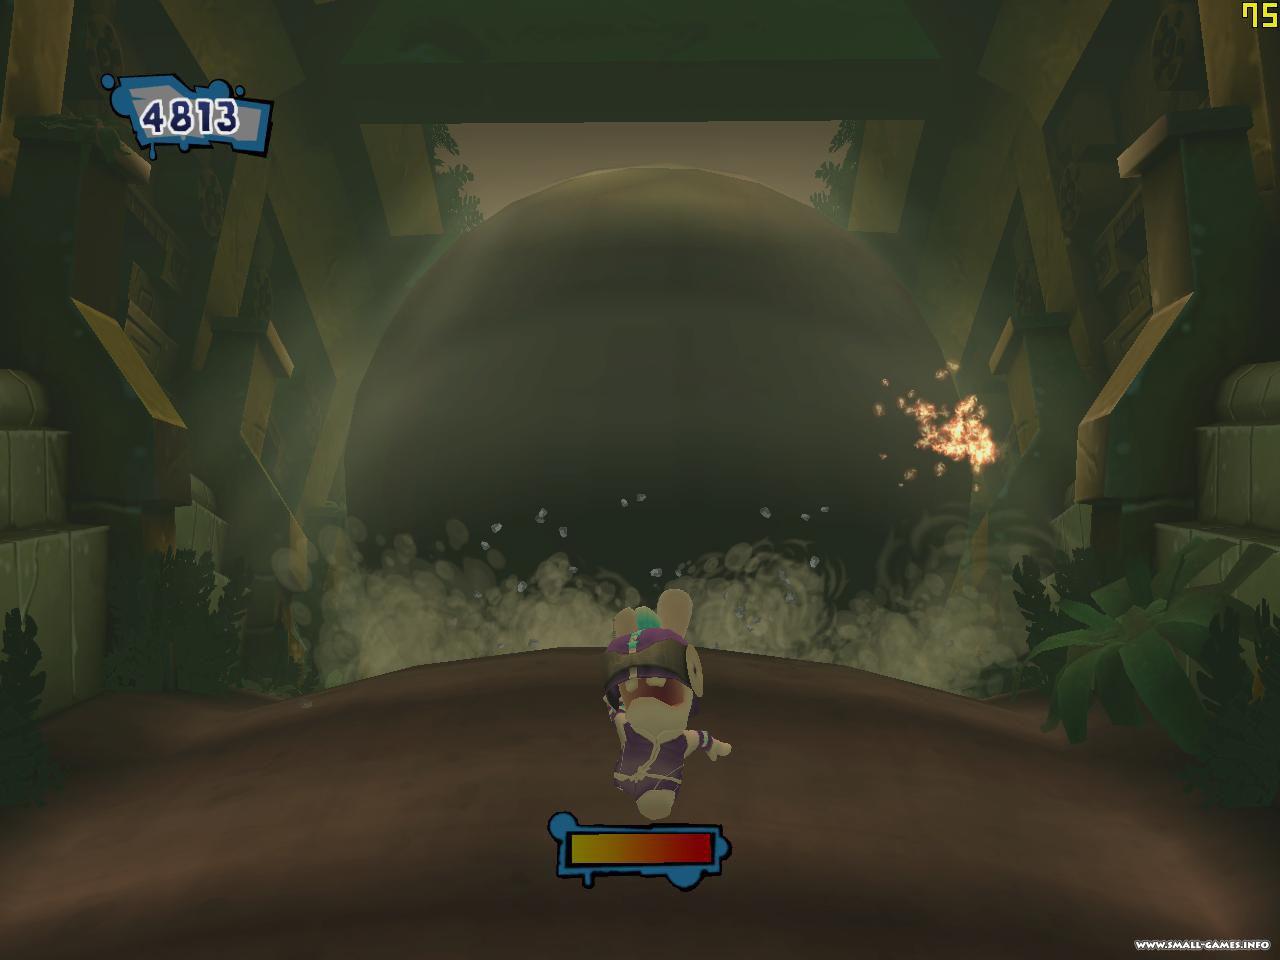 Rayman raving rabbids 2 скачать на компьютер